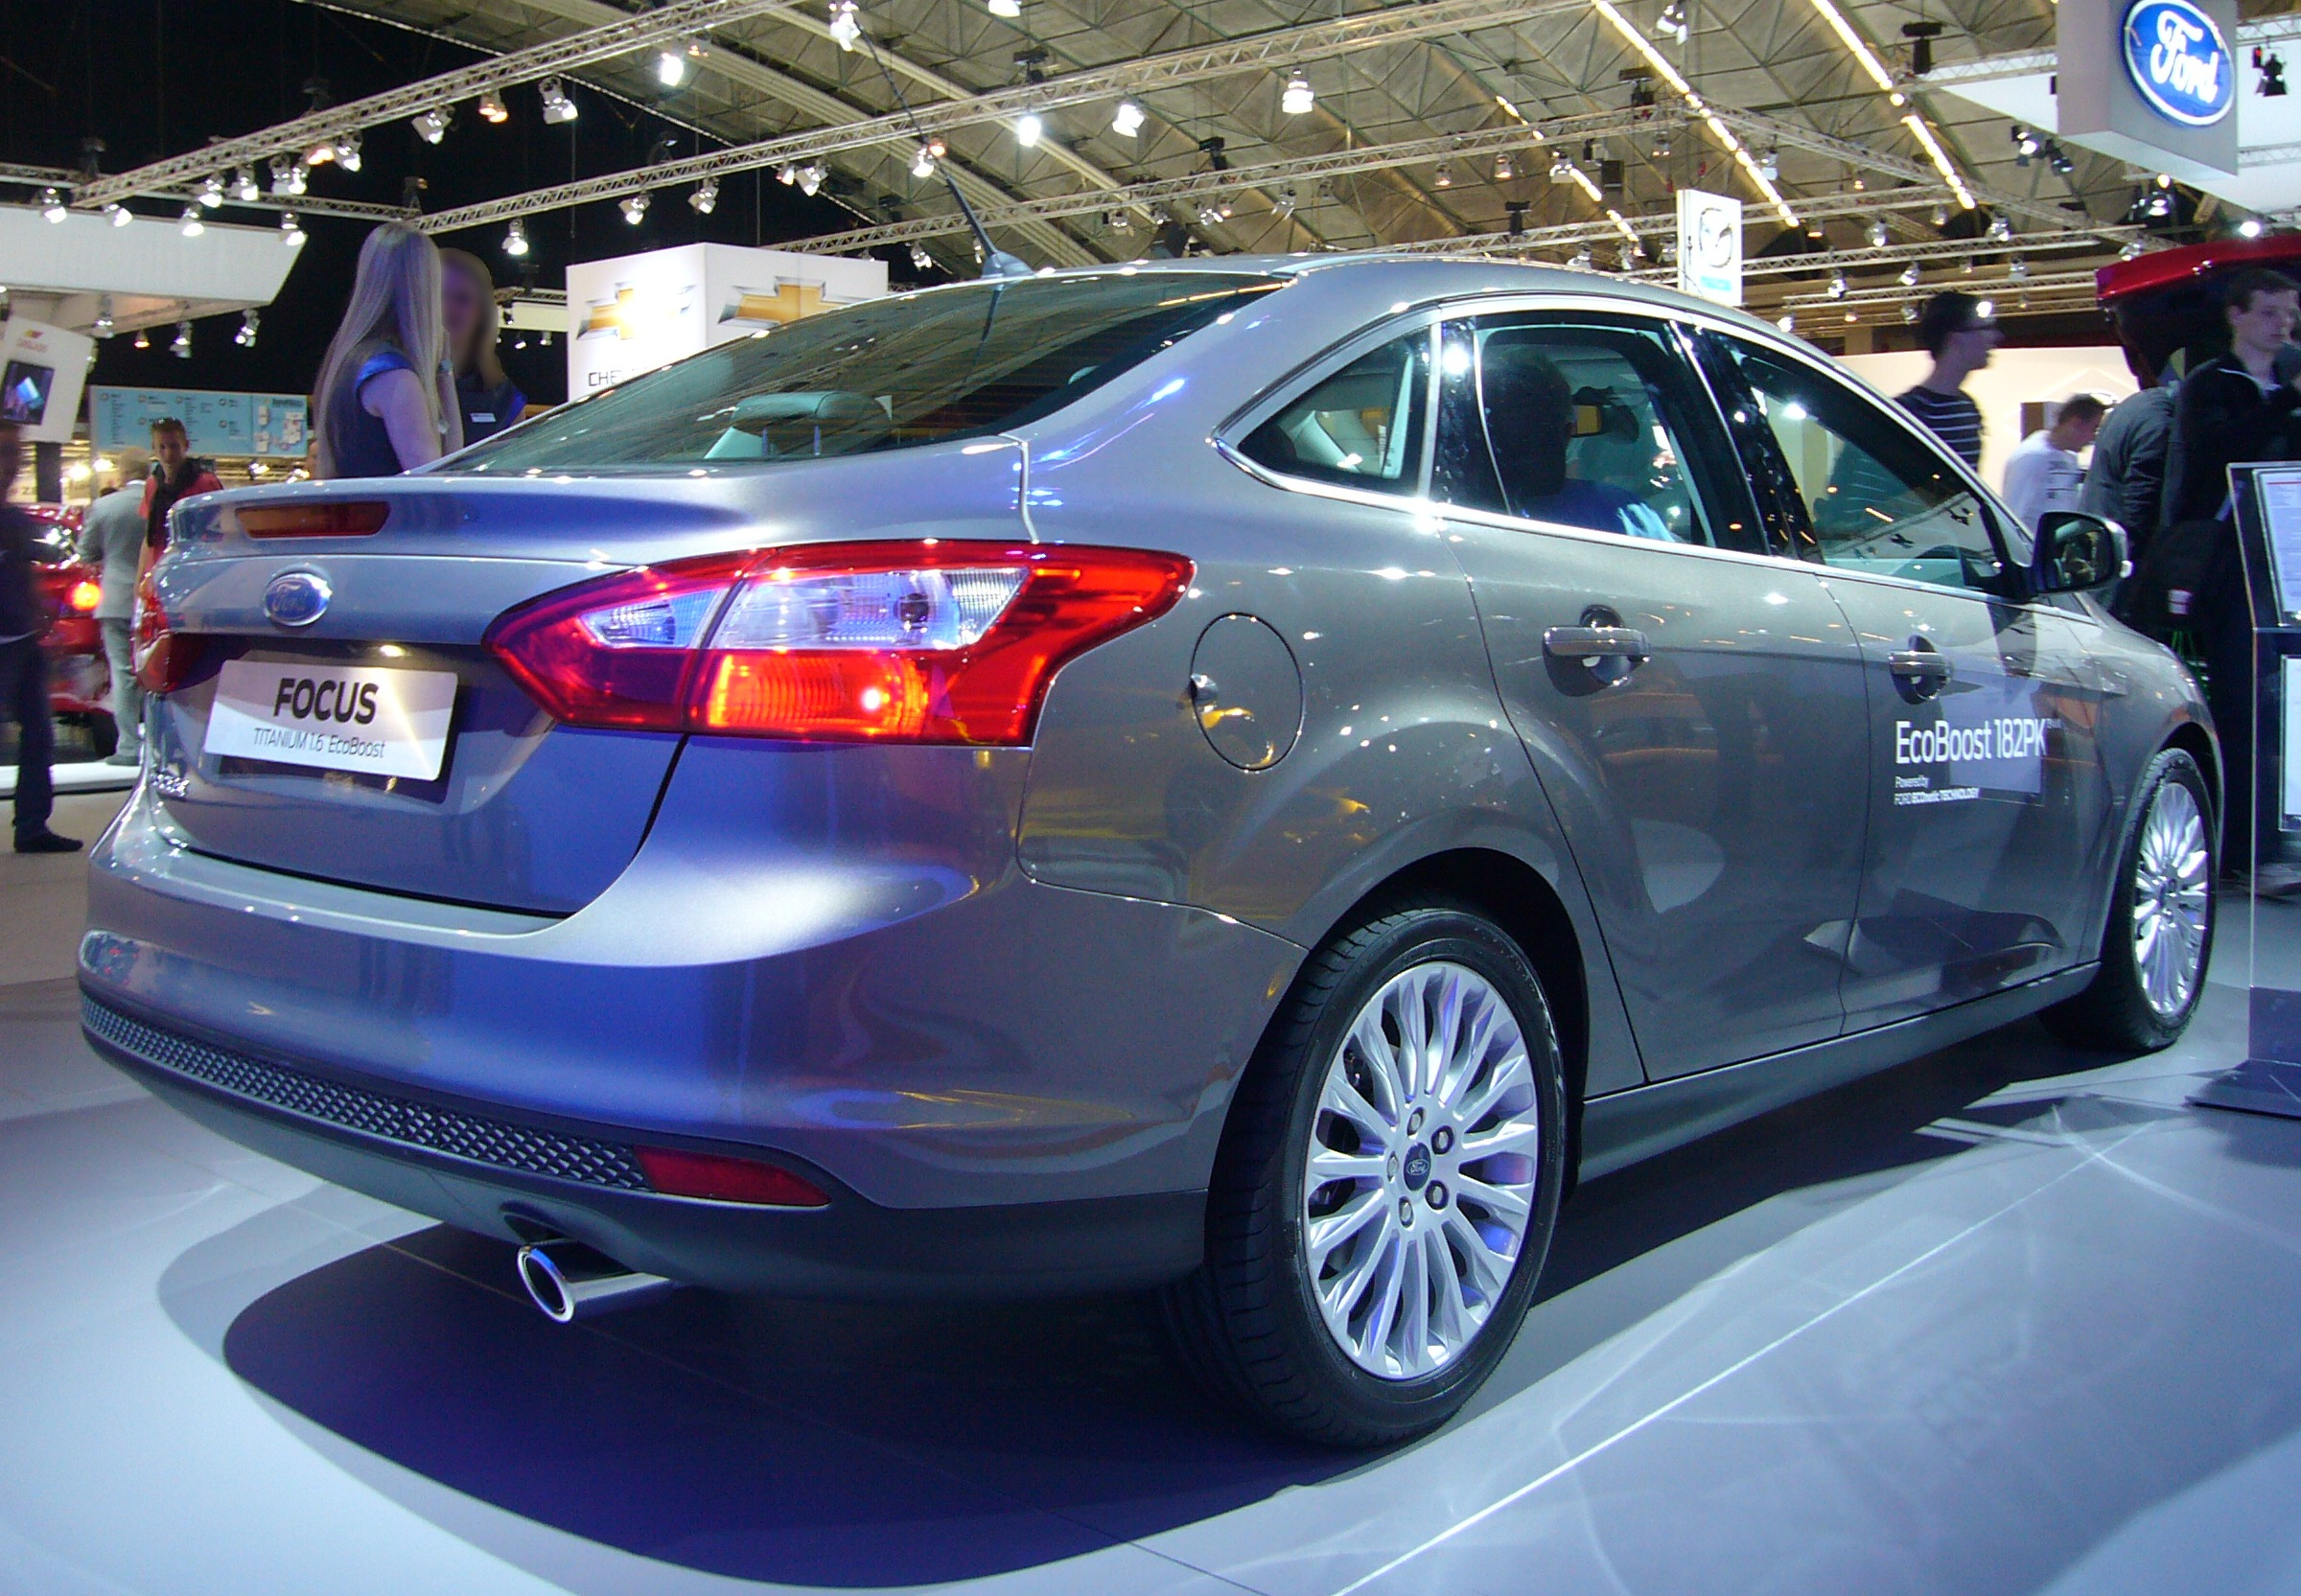 2014 Ford Focus Sedan >> File:Ford Focus sedan (rear quarter).jpg - Wikimedia Commons